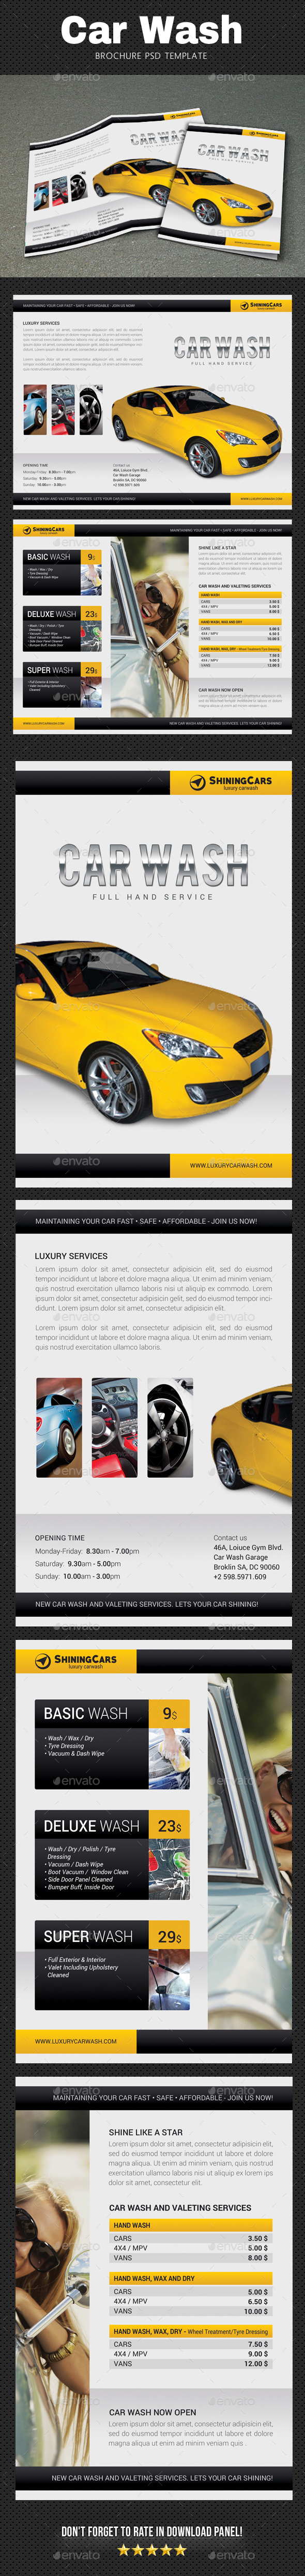 Car Wash Brochure 2 - Catalogs Brochures